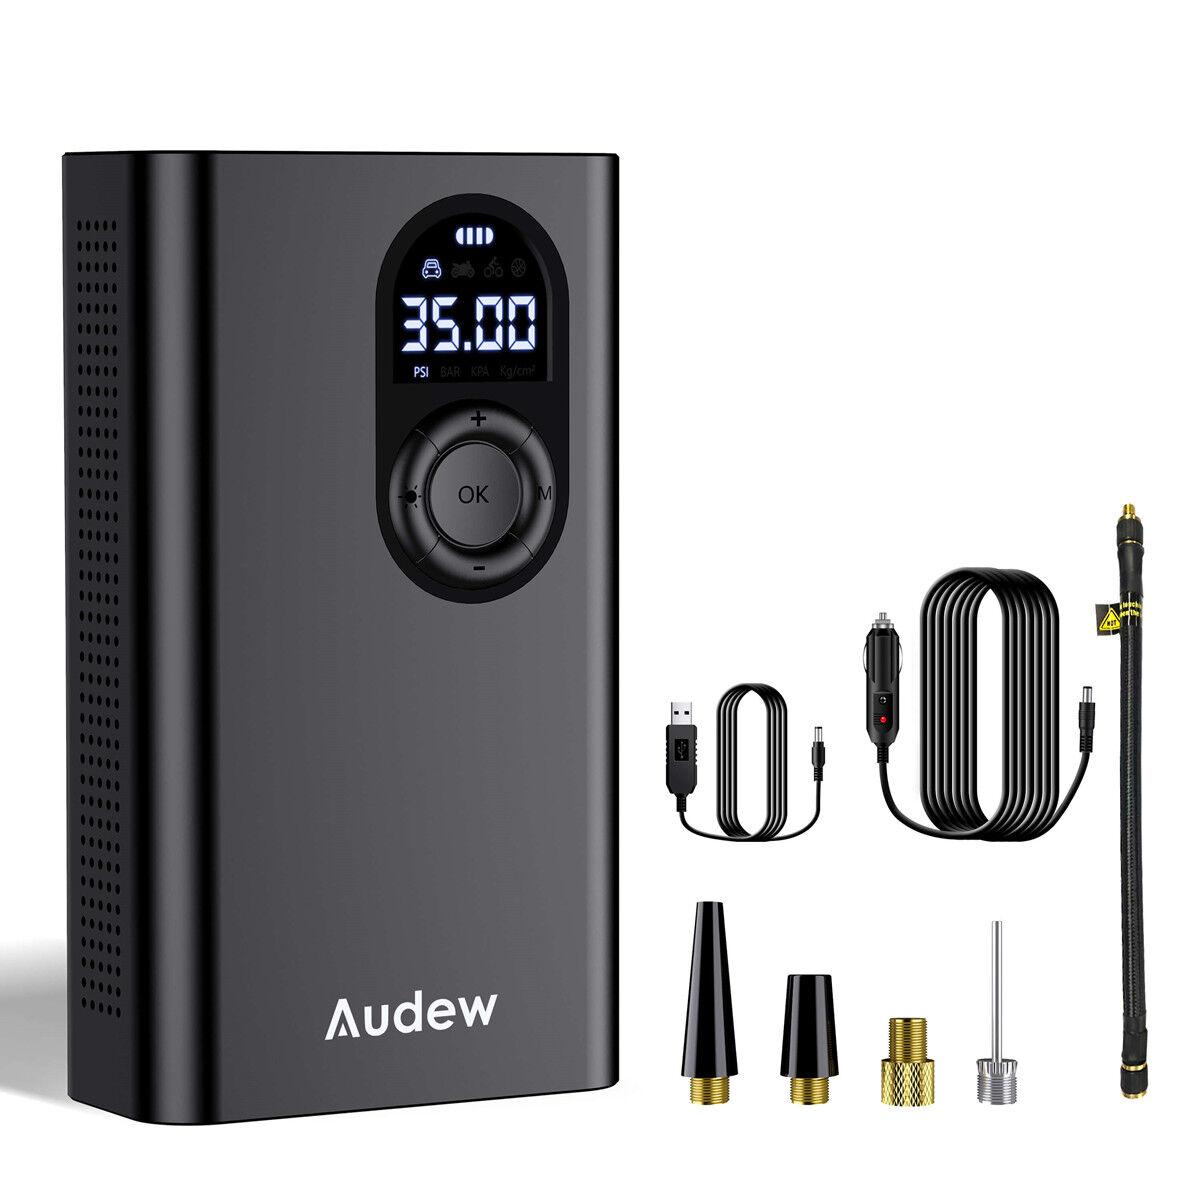 Audew Portable Air Pump 12V 150PSI Mini 3 * 2000mAh Capacity Rechargeable Electric Air Pump